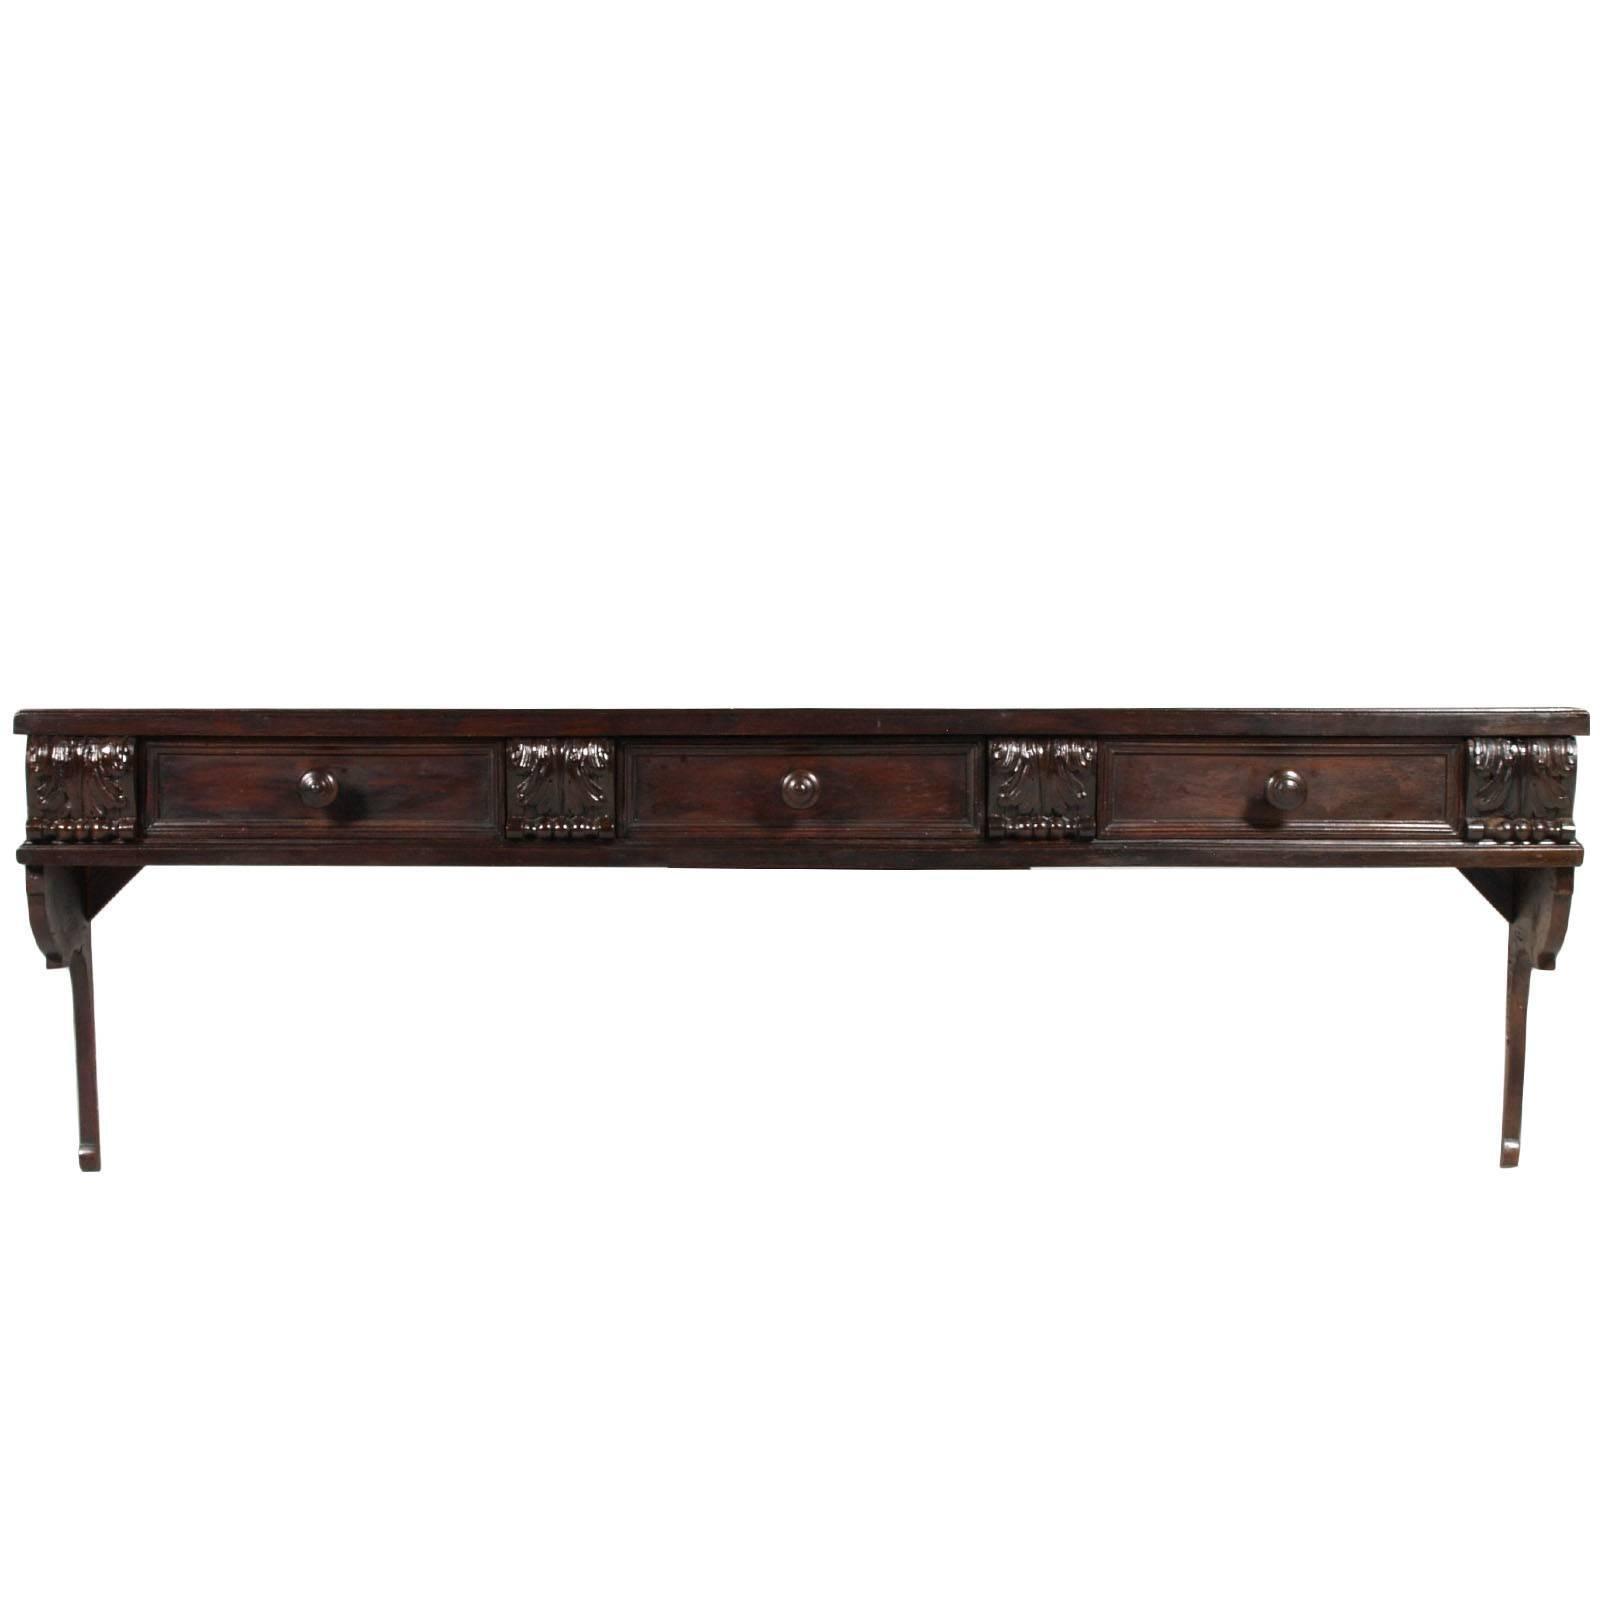 Italian Art Nouveau Shelf Or Hanging Plate Racks, Dark Walnut,